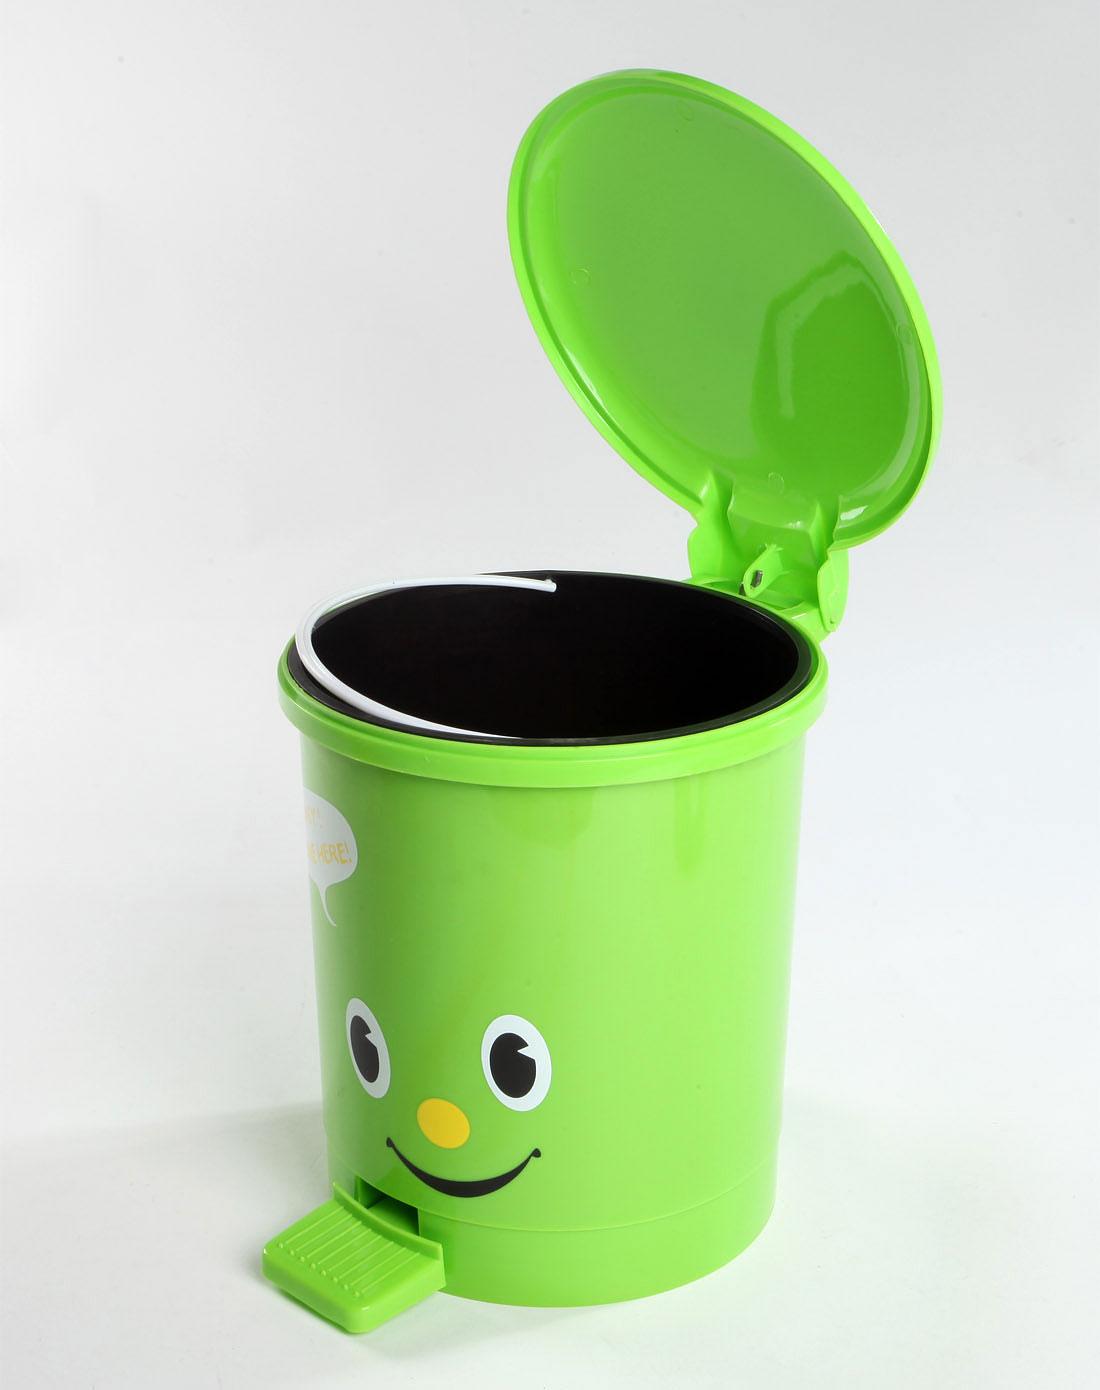 h&3家居用品专场3l脚踏式优质垃圾桶绿色